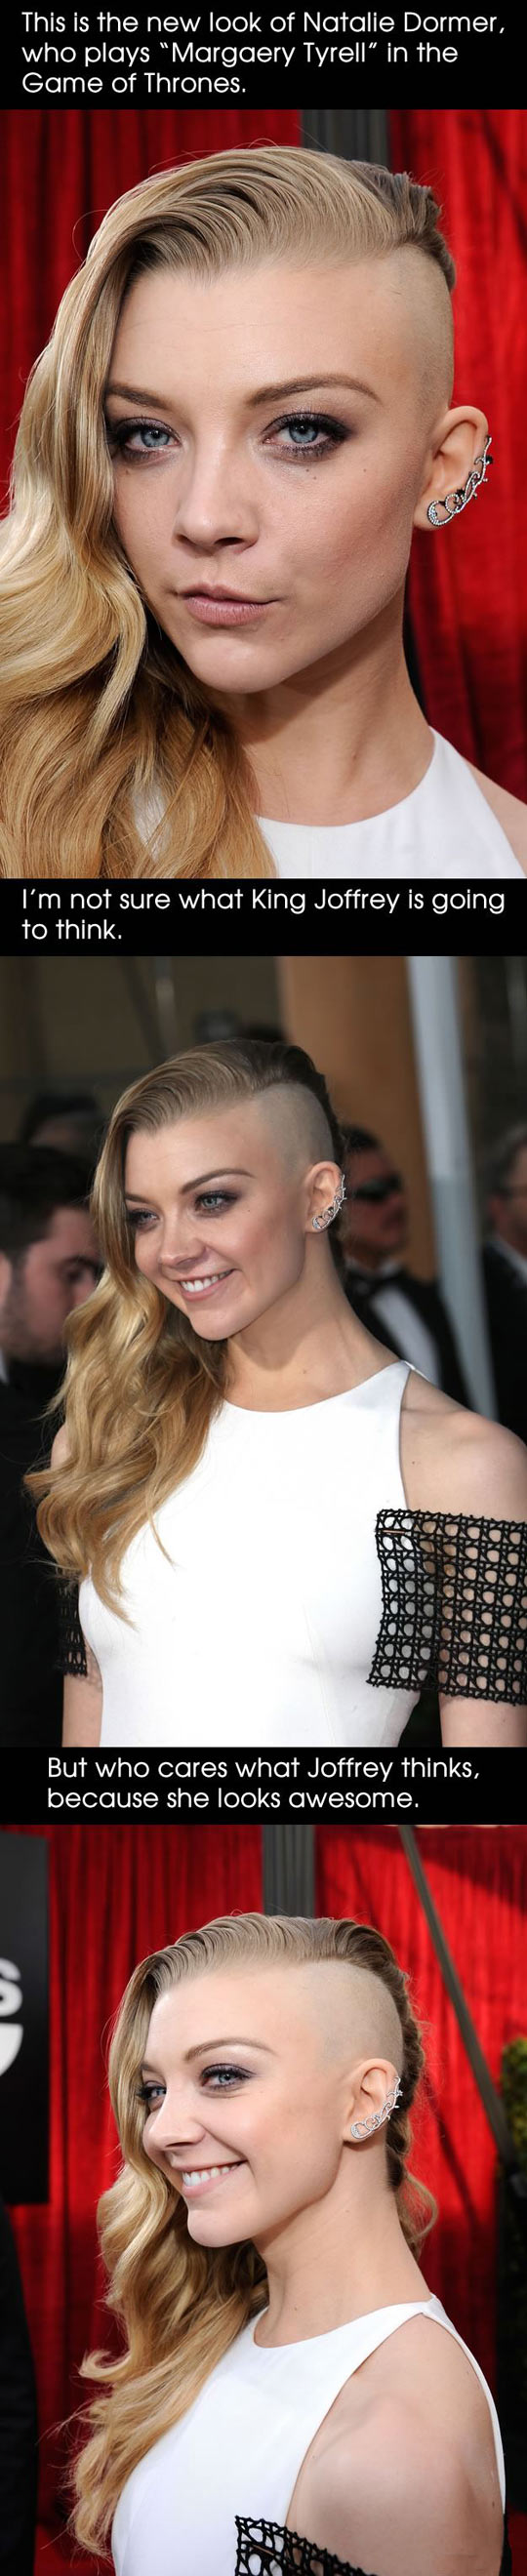 funny-Natalie-Dormer-hair-shaved-look